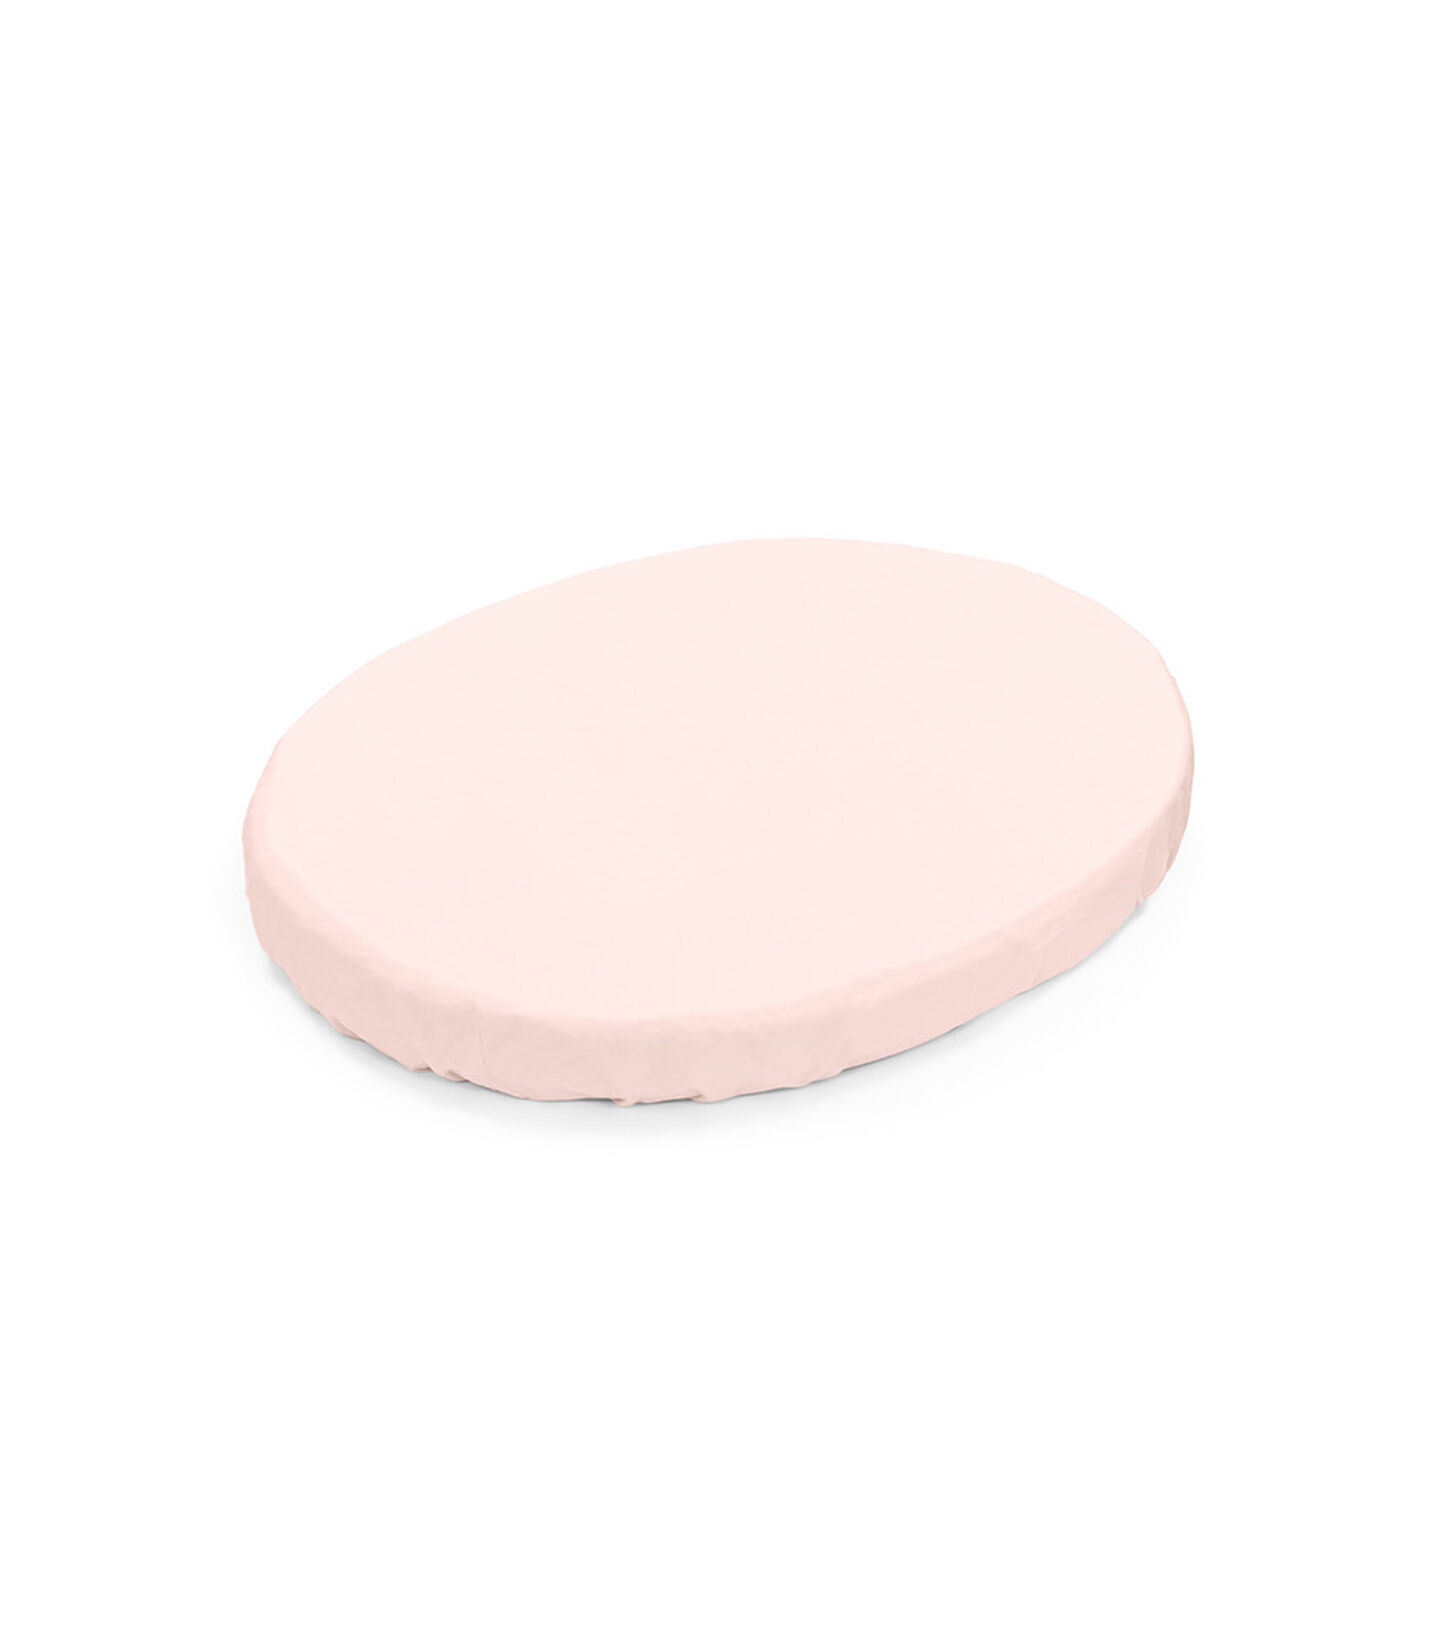 Stokke® Sleepi™ Mini Spannbettlaken Peachy Pink, Peachy Pink, mainview